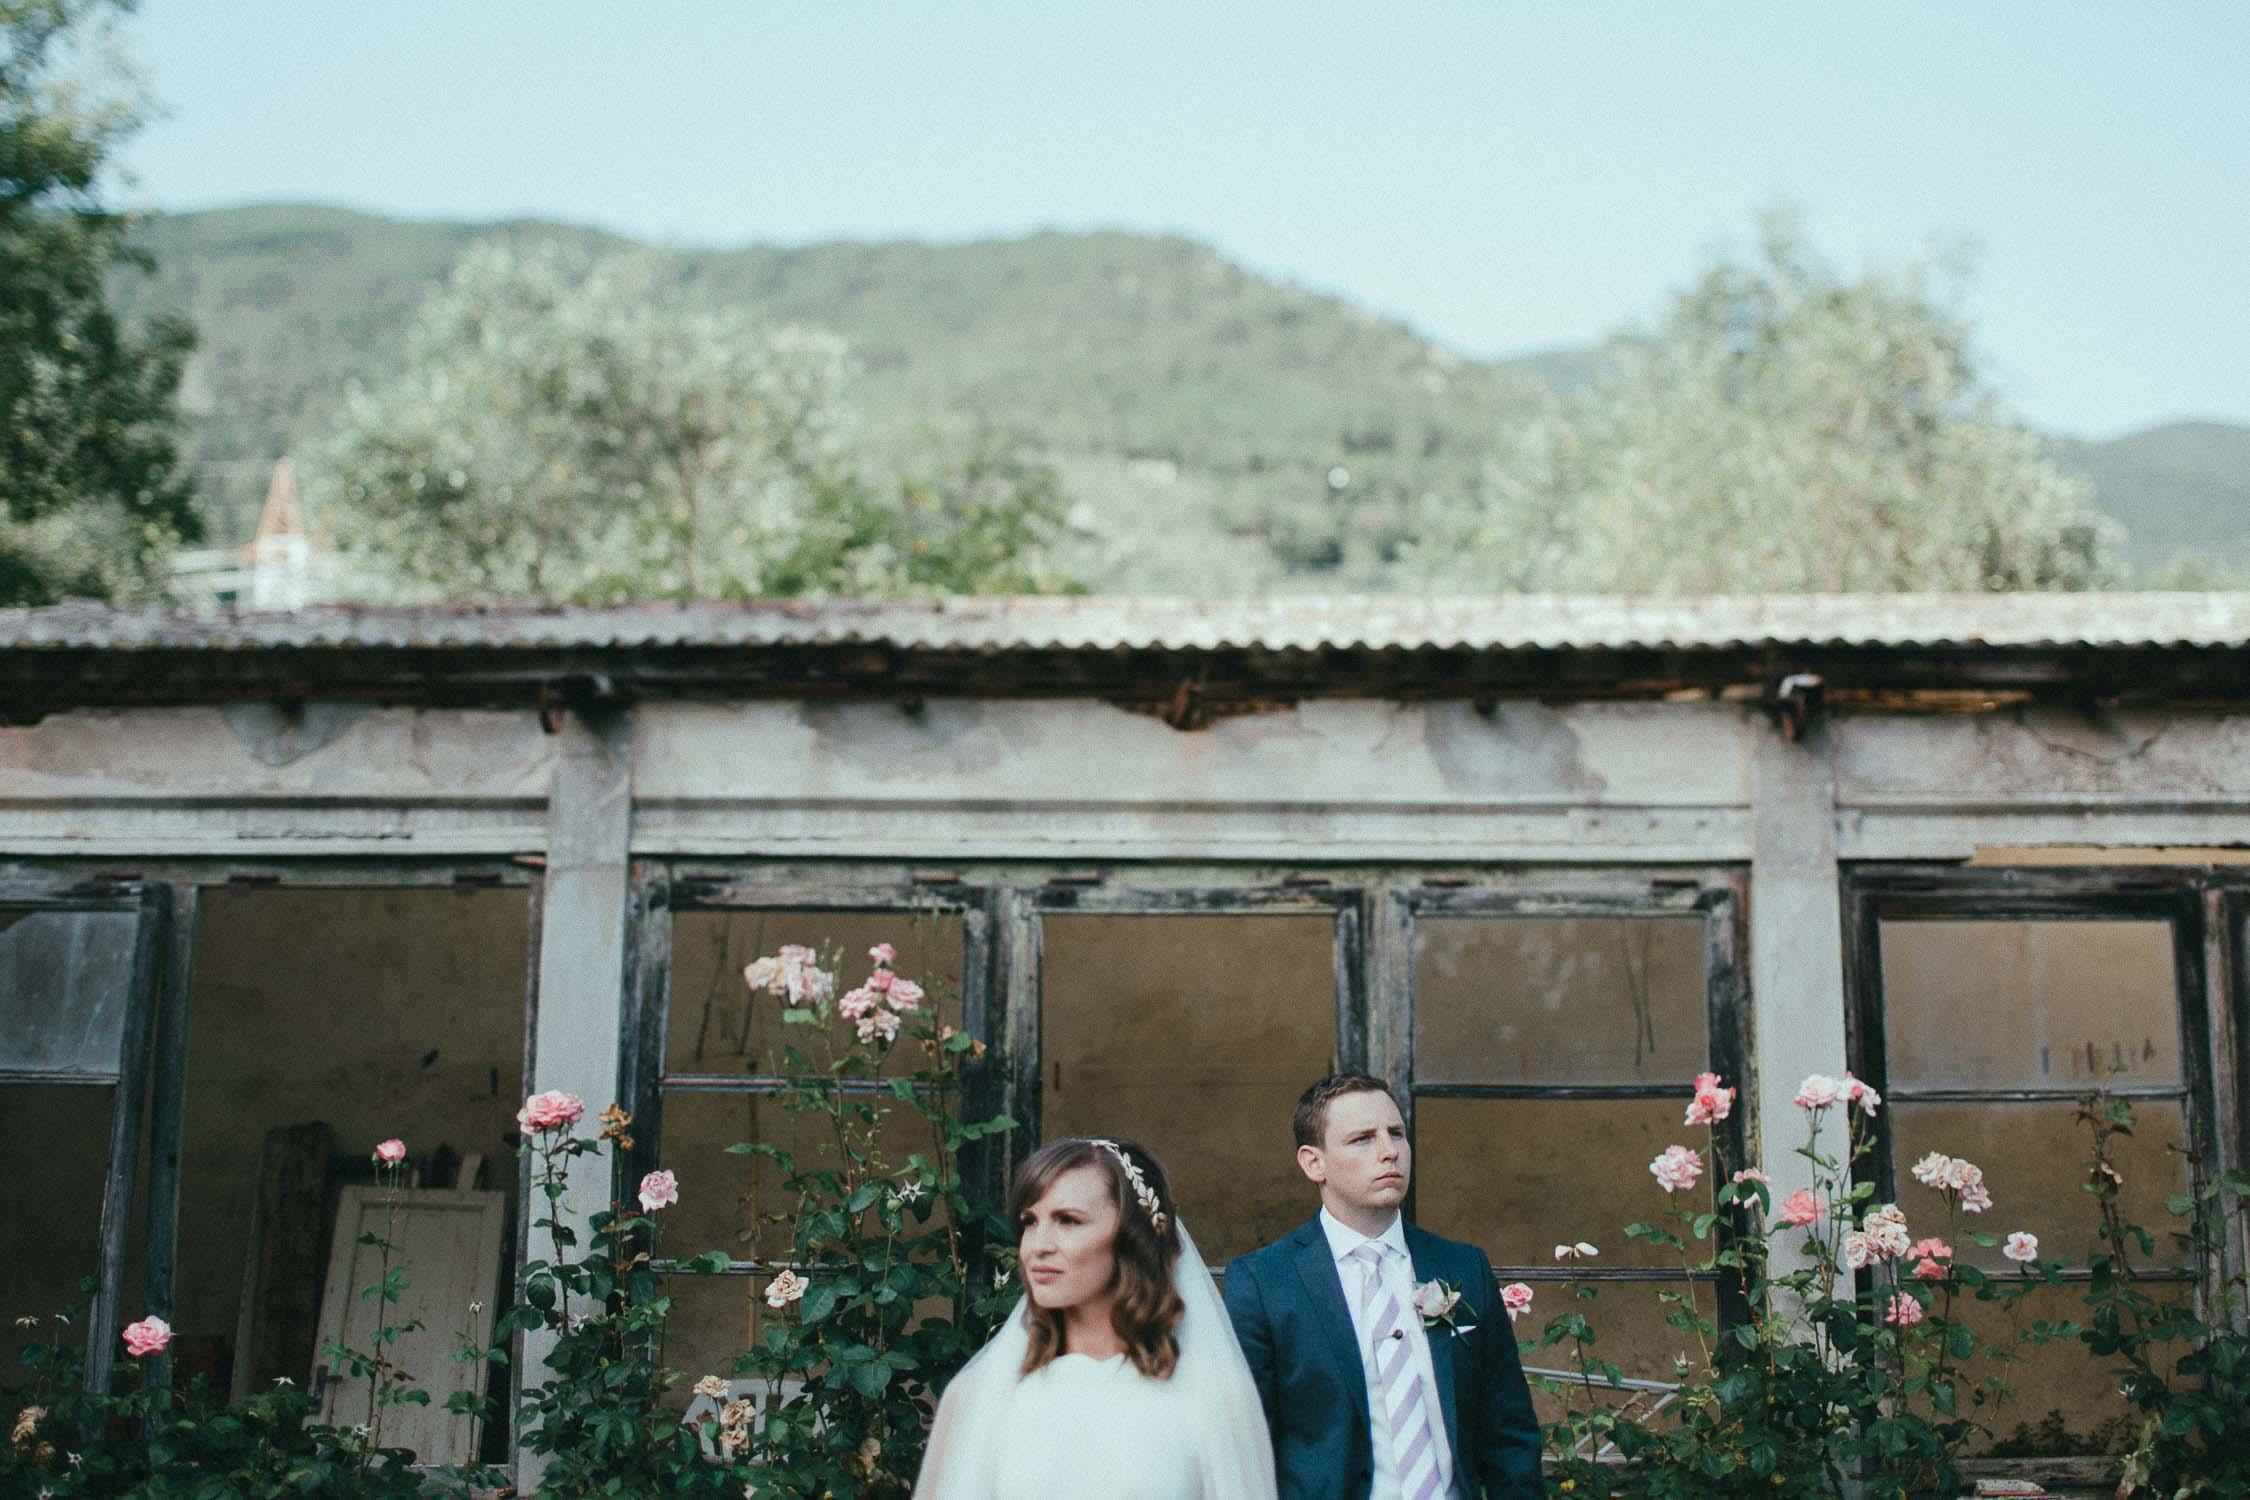 couple-portraits-destination-wedding (4).jpg